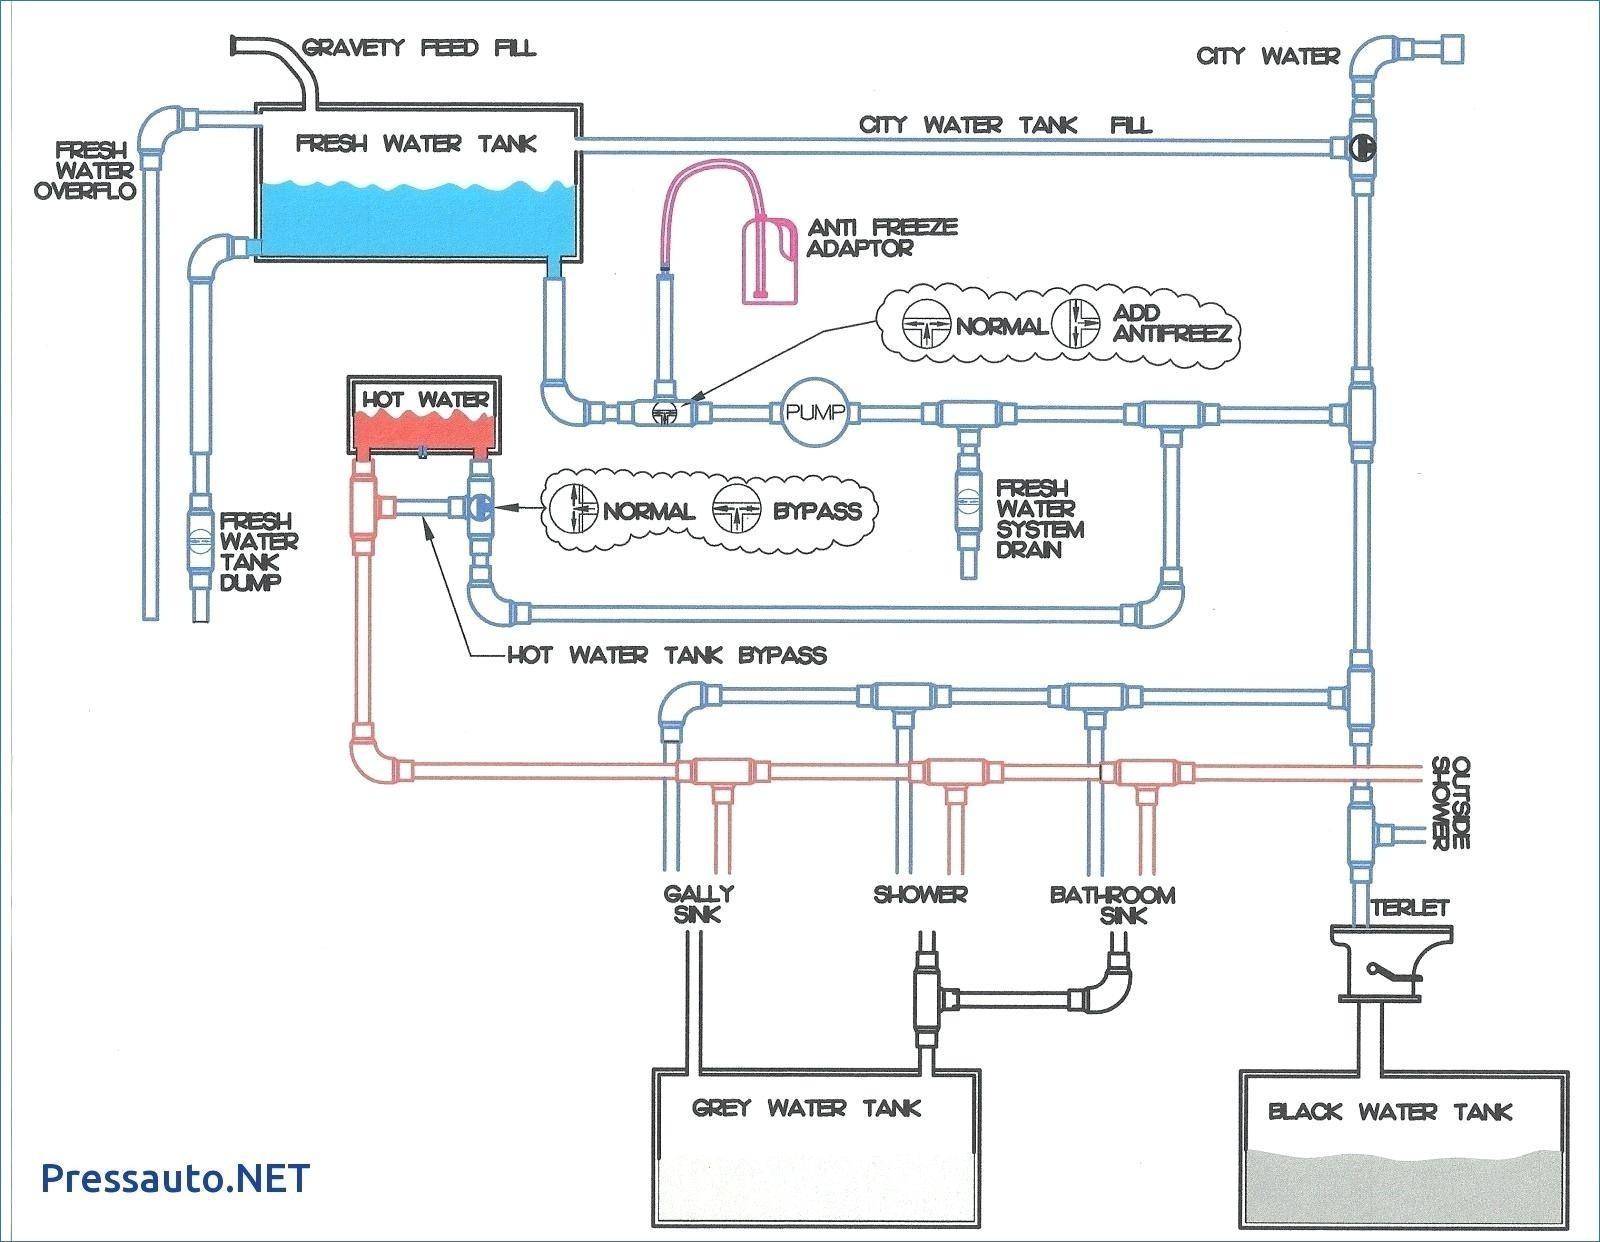 Diagram 2010 Keystone Sprinter Wiring Diagram Full Version Hd Quality Wiring Diagram Seemdiagram Eracleaturismo It